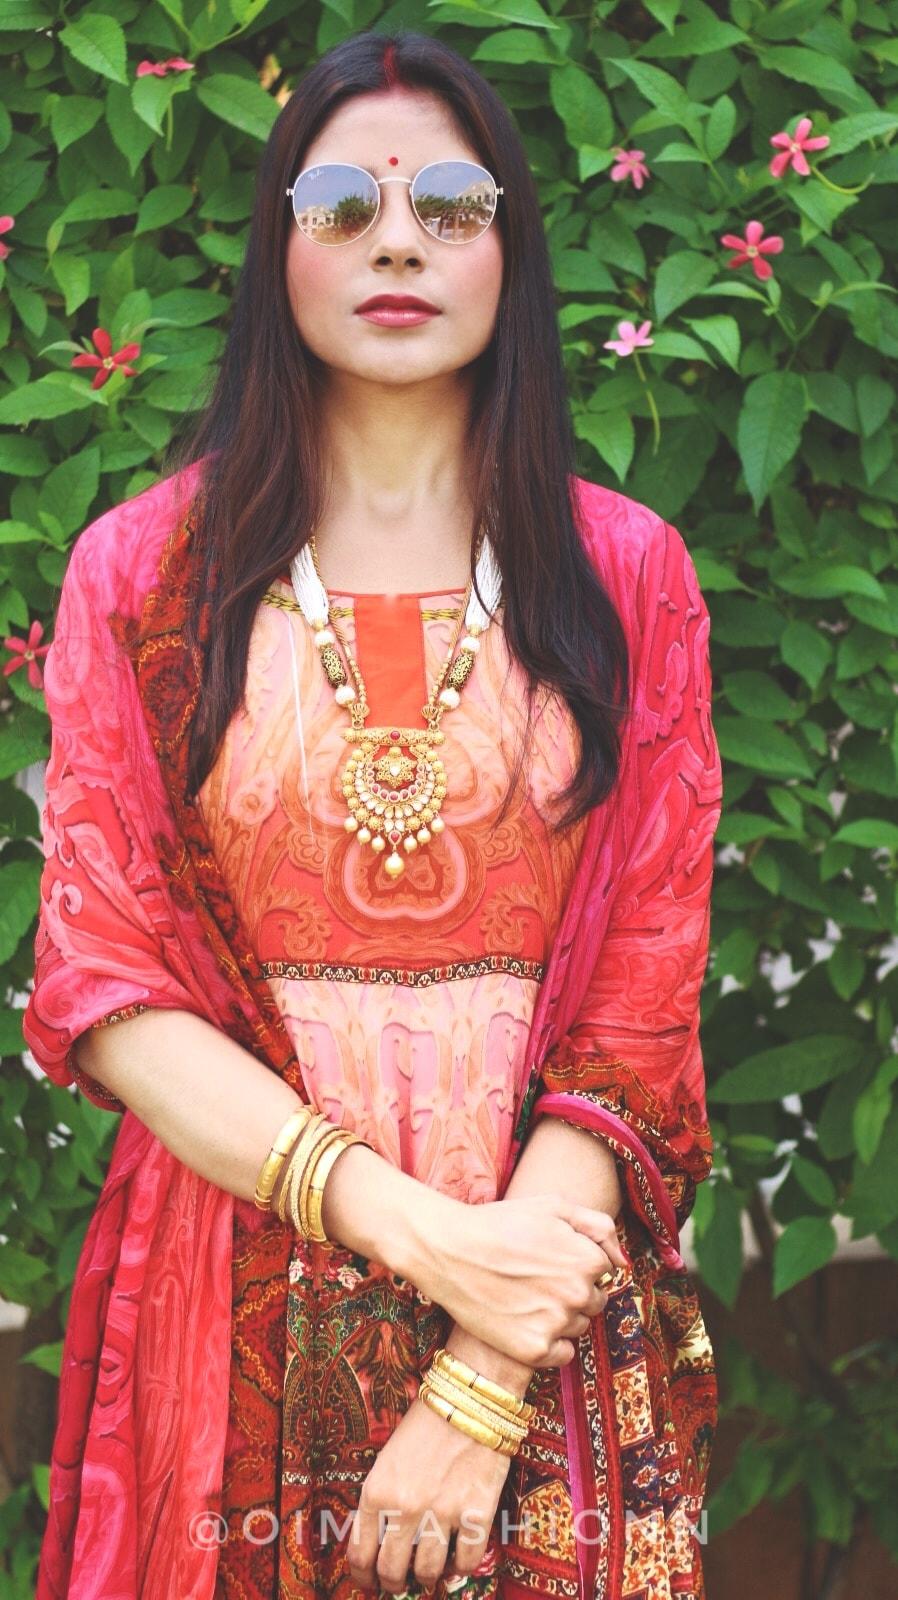 Sabyasachi Mukherjee, Designer suits, Crepe Dresses, Anarkali Suits, Indian Jewellery, Ritu Pandit, Oimfashion, Wishalley.com